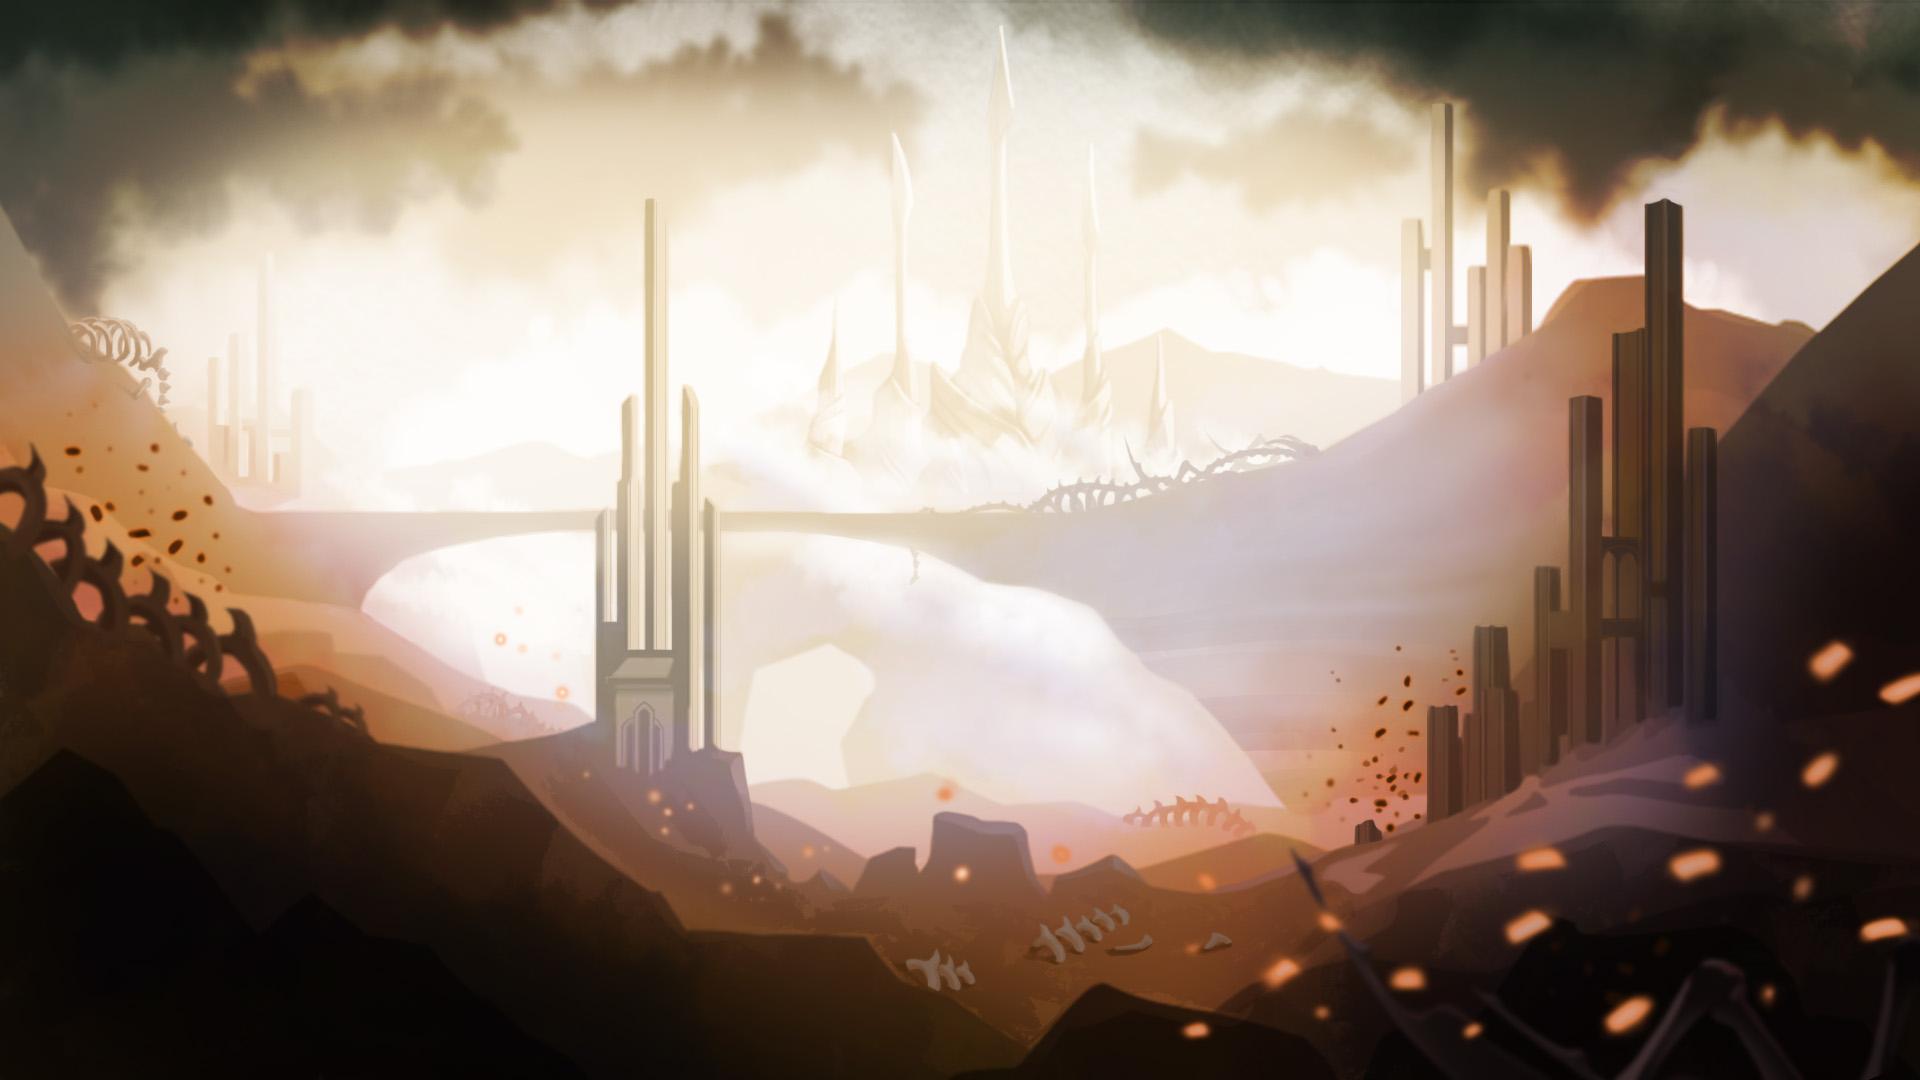 Fantasy Environment 02